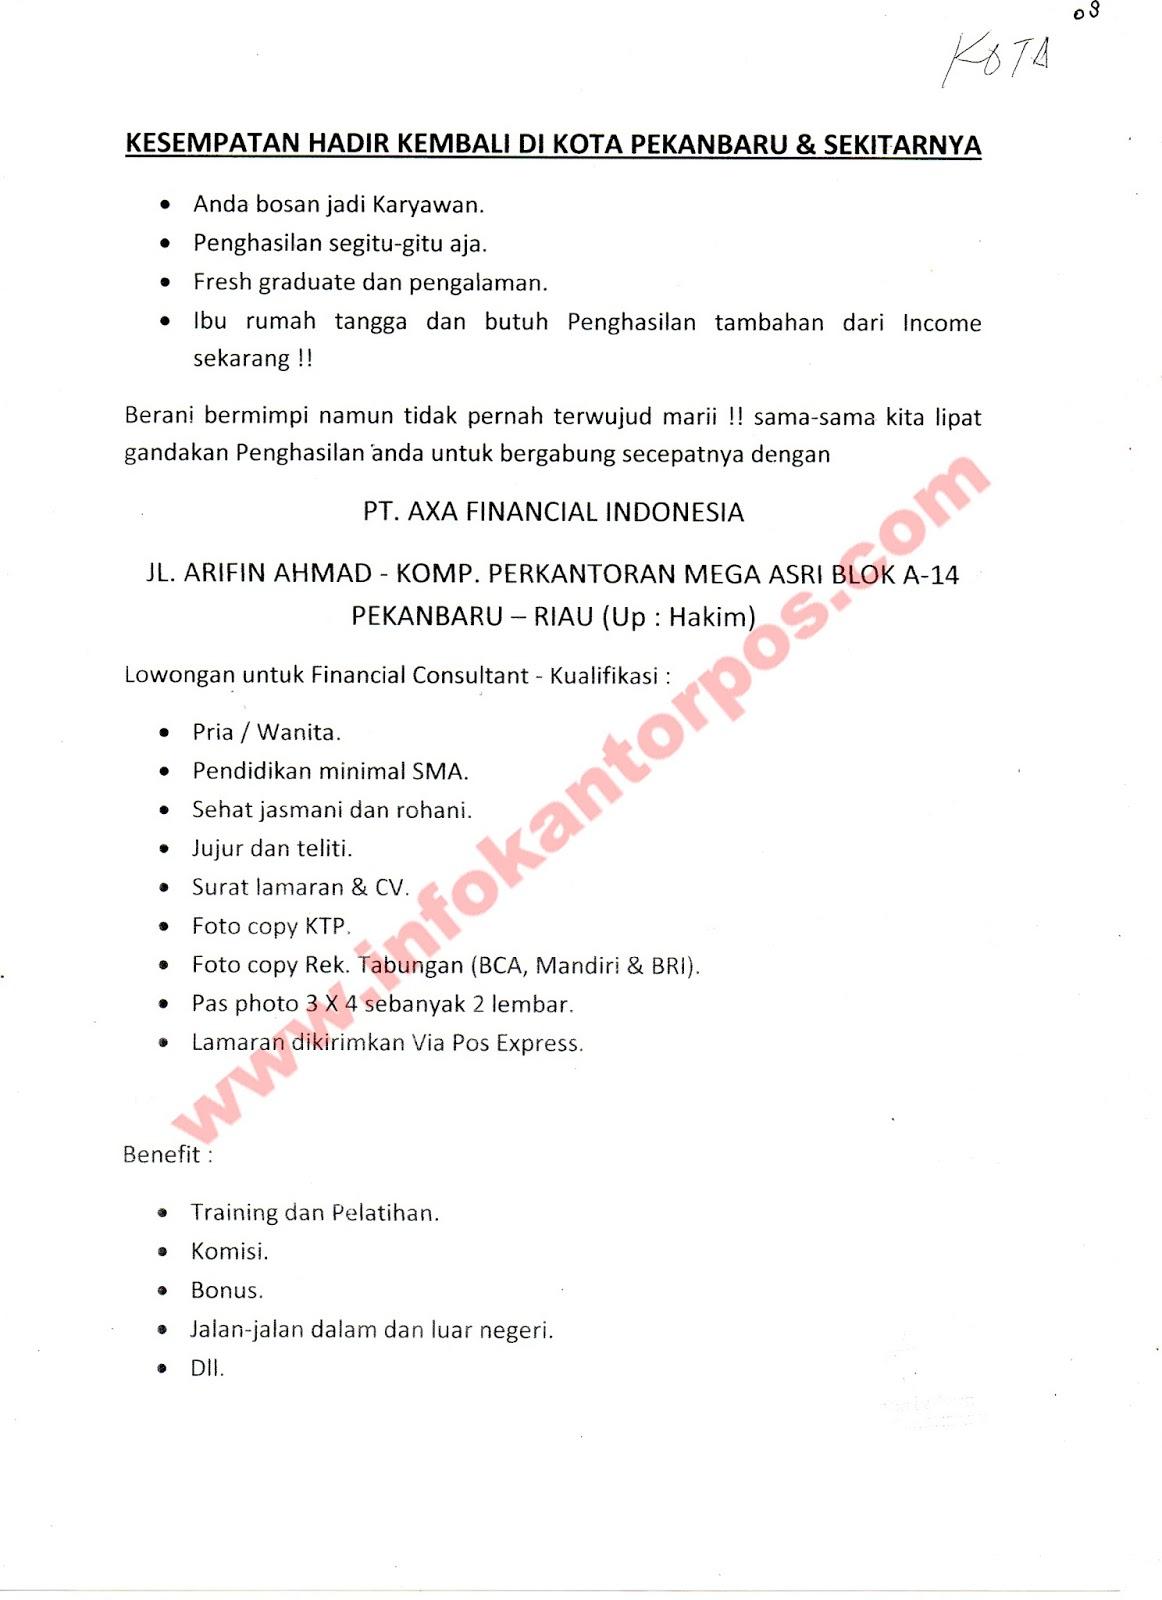 Lowongan Kerja Pt Axa Financial Indonesia Juli 2017 Www Infokantorpos Com